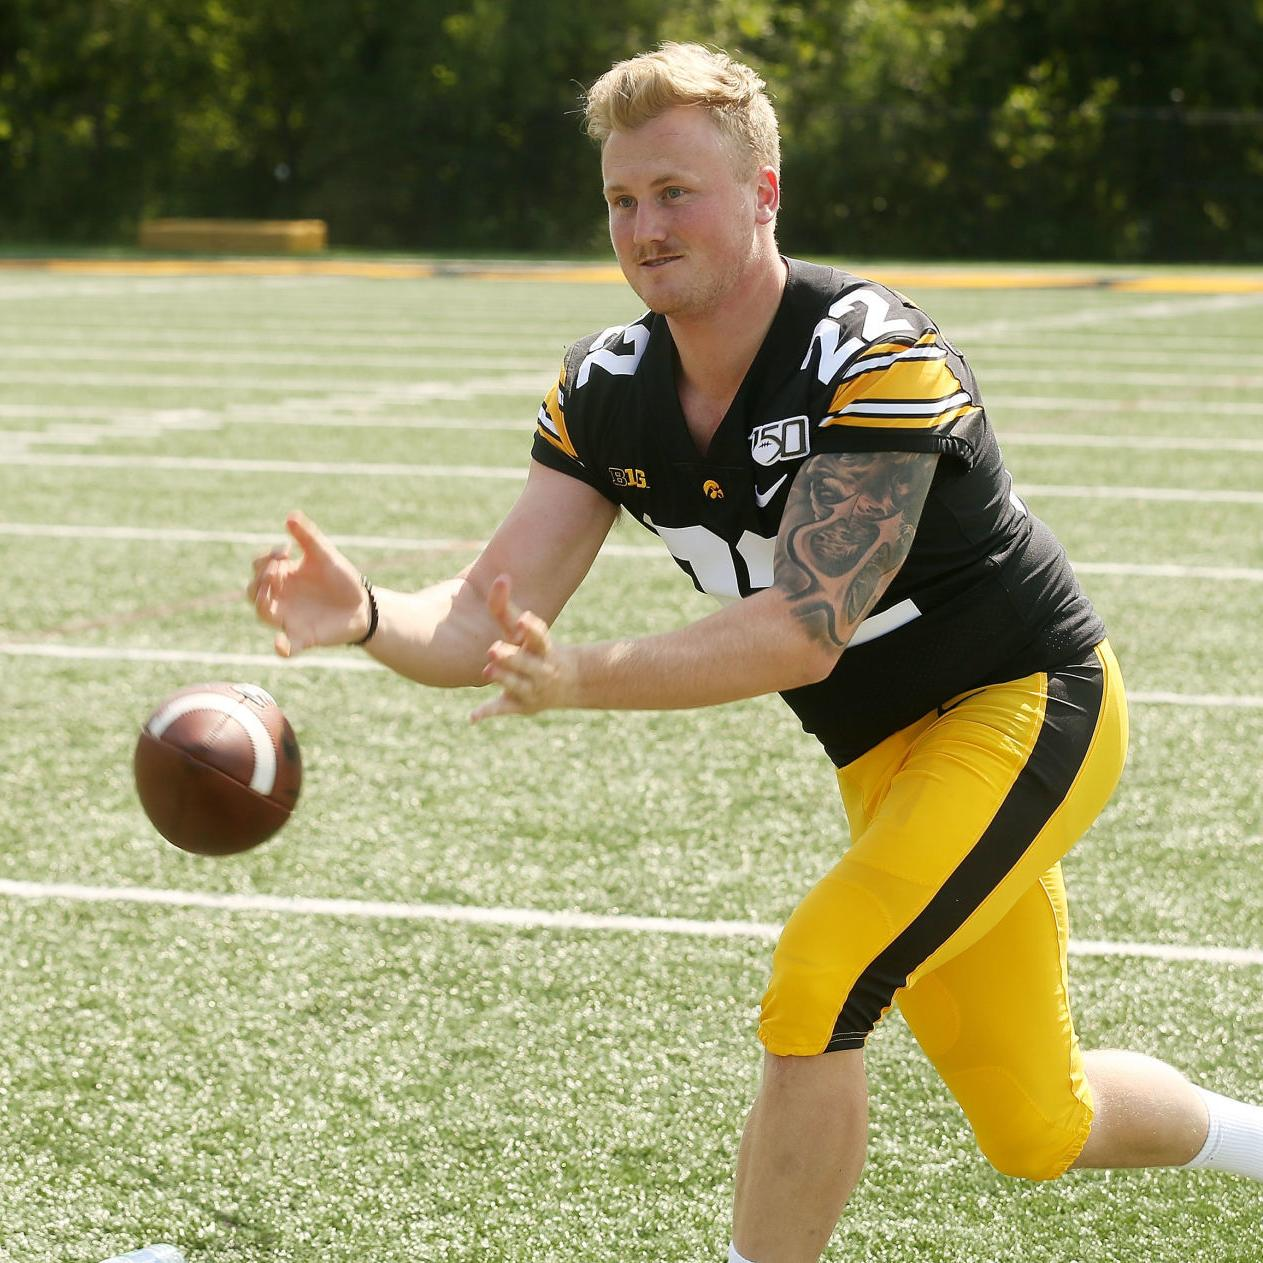 Iowa football: Kickers excel in Hawkeye scrimmage | Football